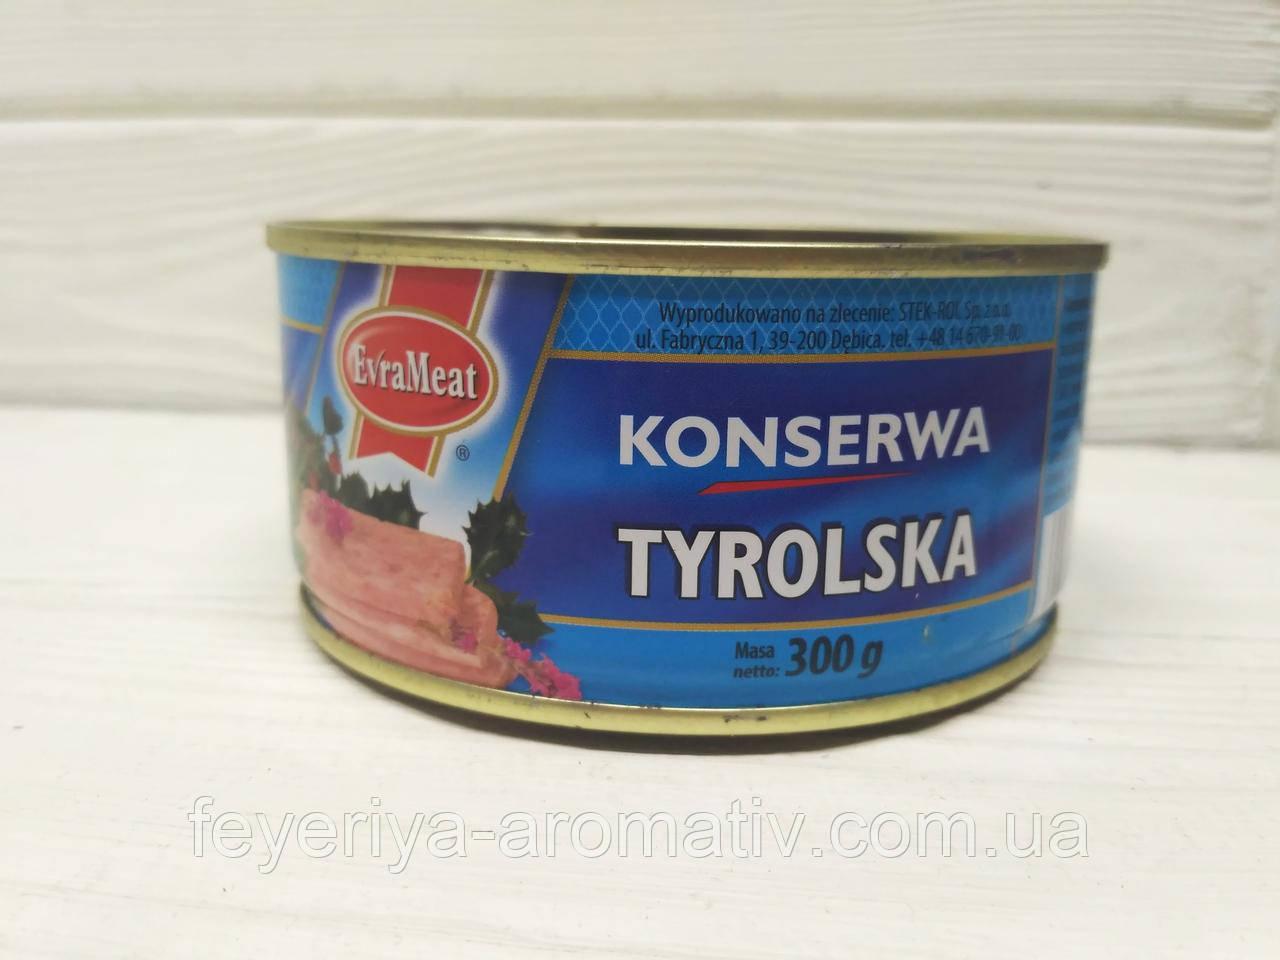 Консерва EvraMeat Konserwa tyrolska (курица и свинина), 300гр (Польша)